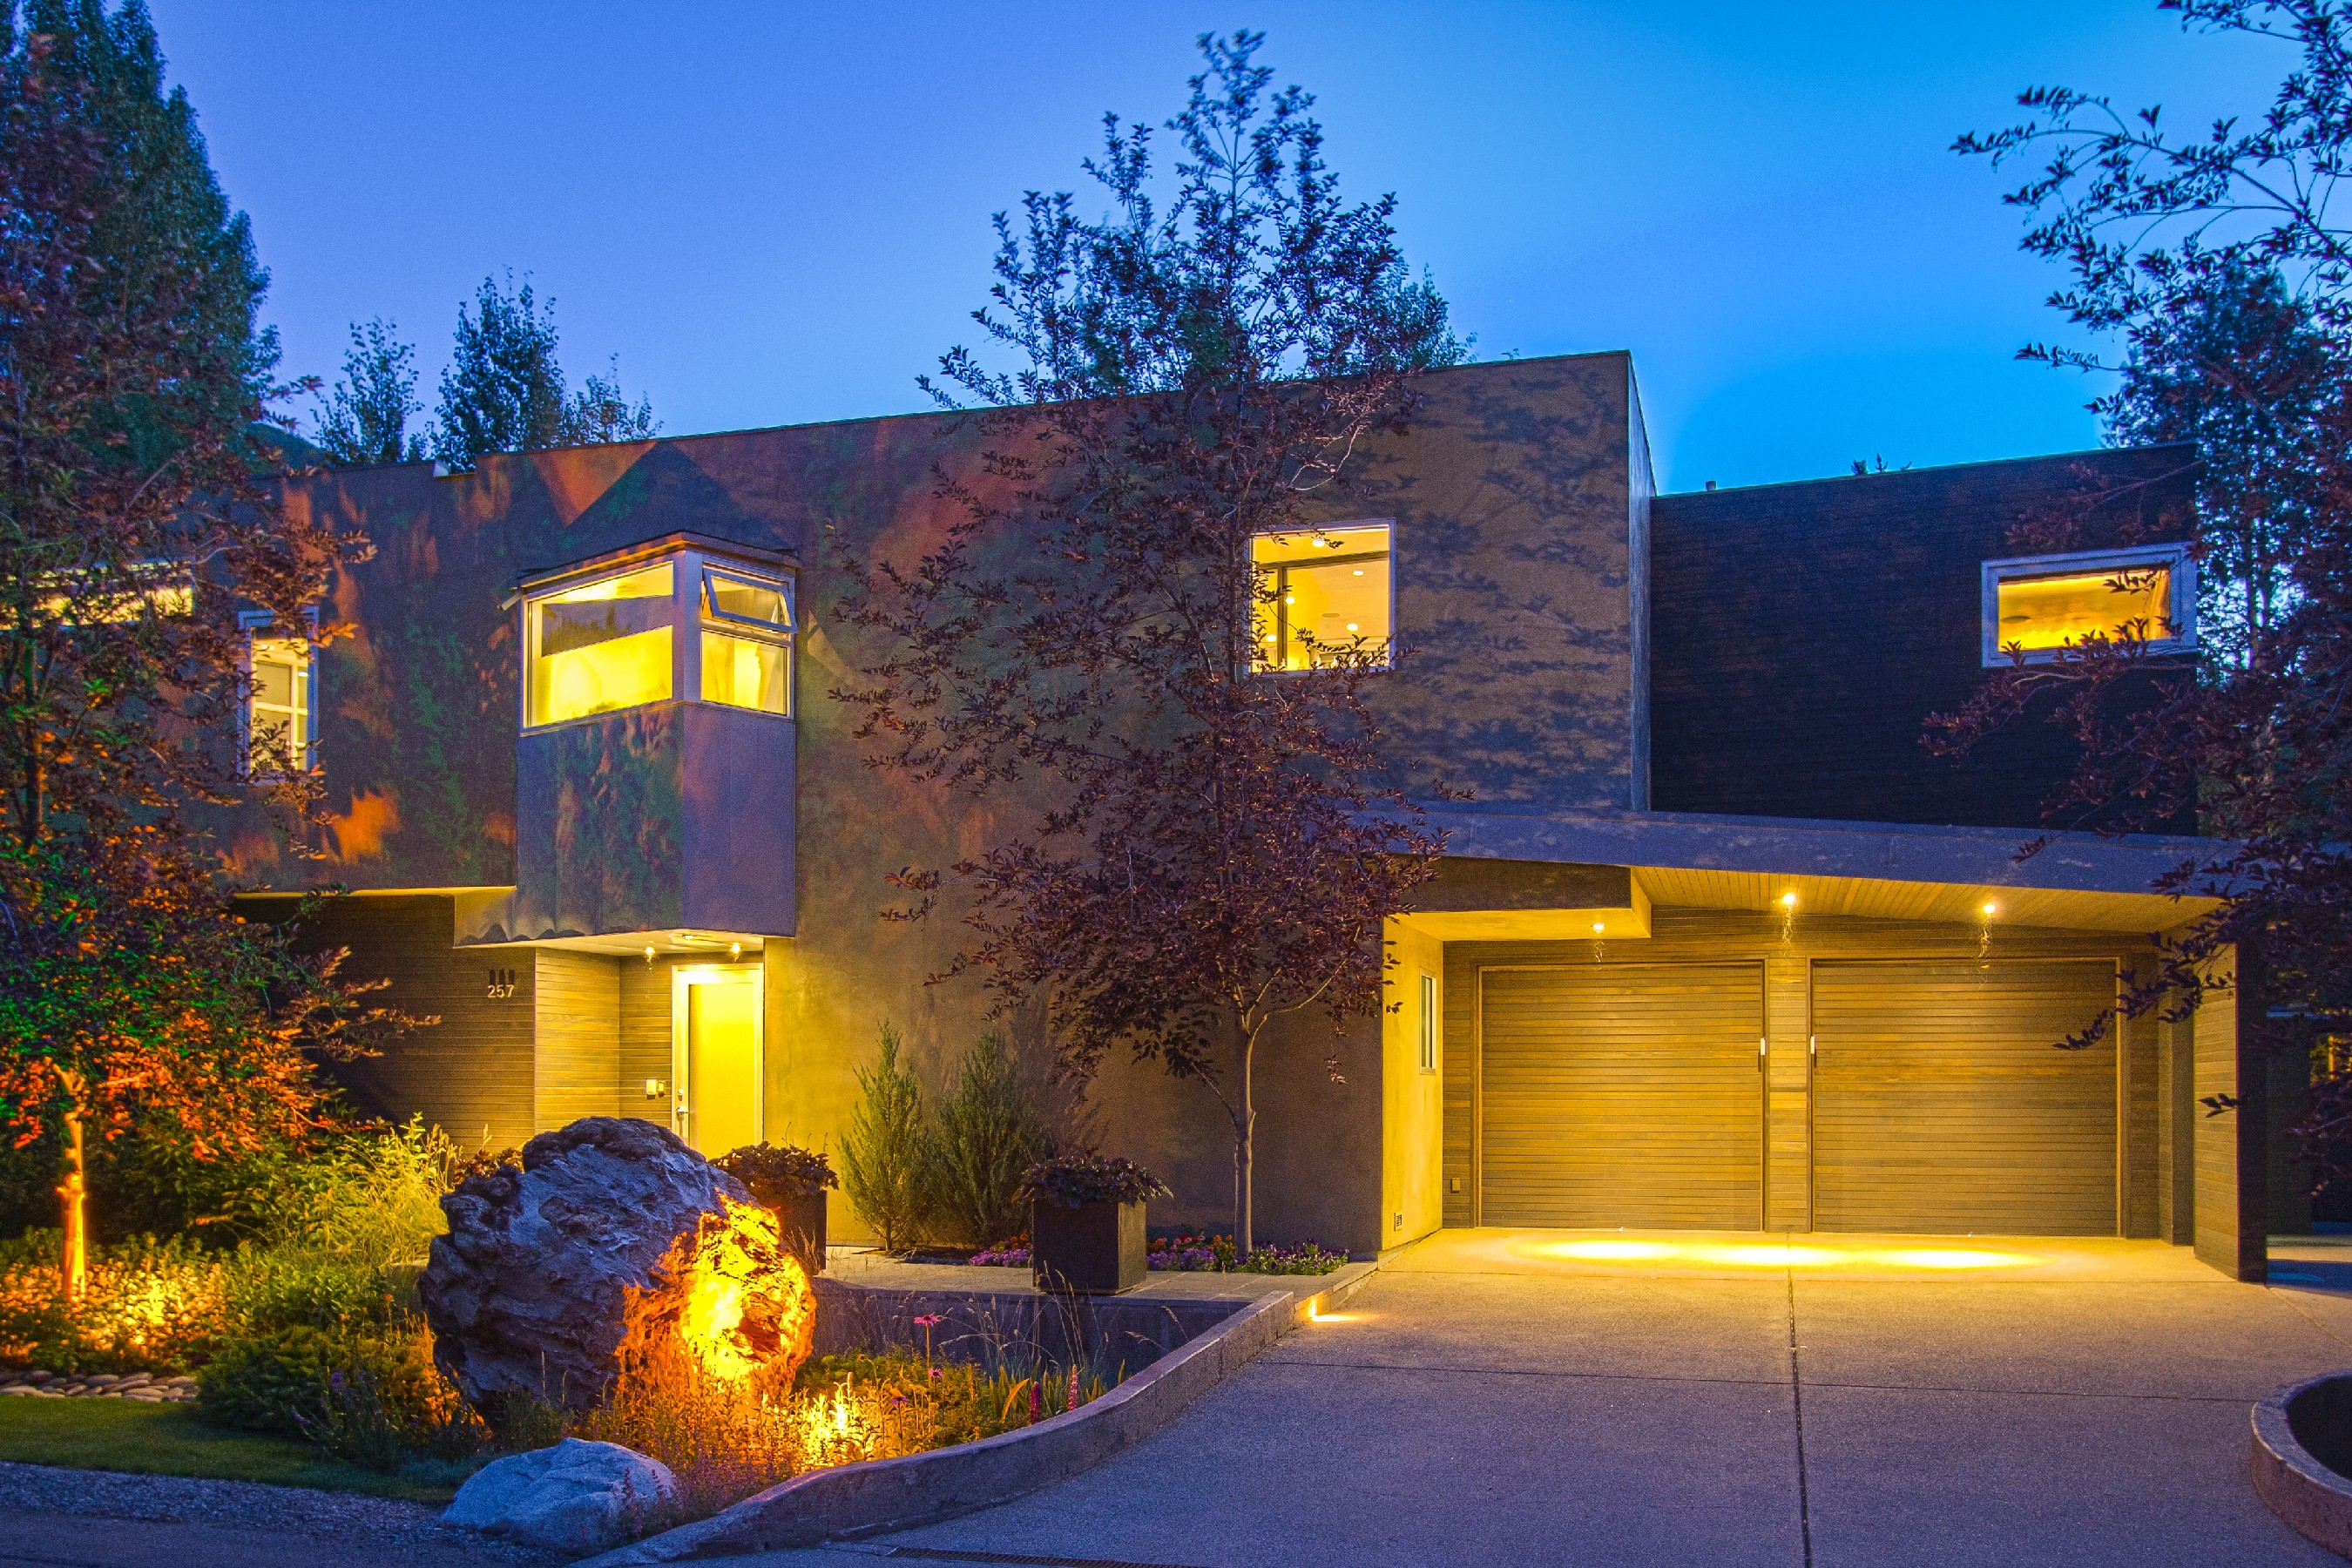 Casa Unifamiliar por un Venta en Spectacular Downtown Aspen Contemporary Home 257 Park Avenue Aspen, Colorado, 81611 Estados Unidos